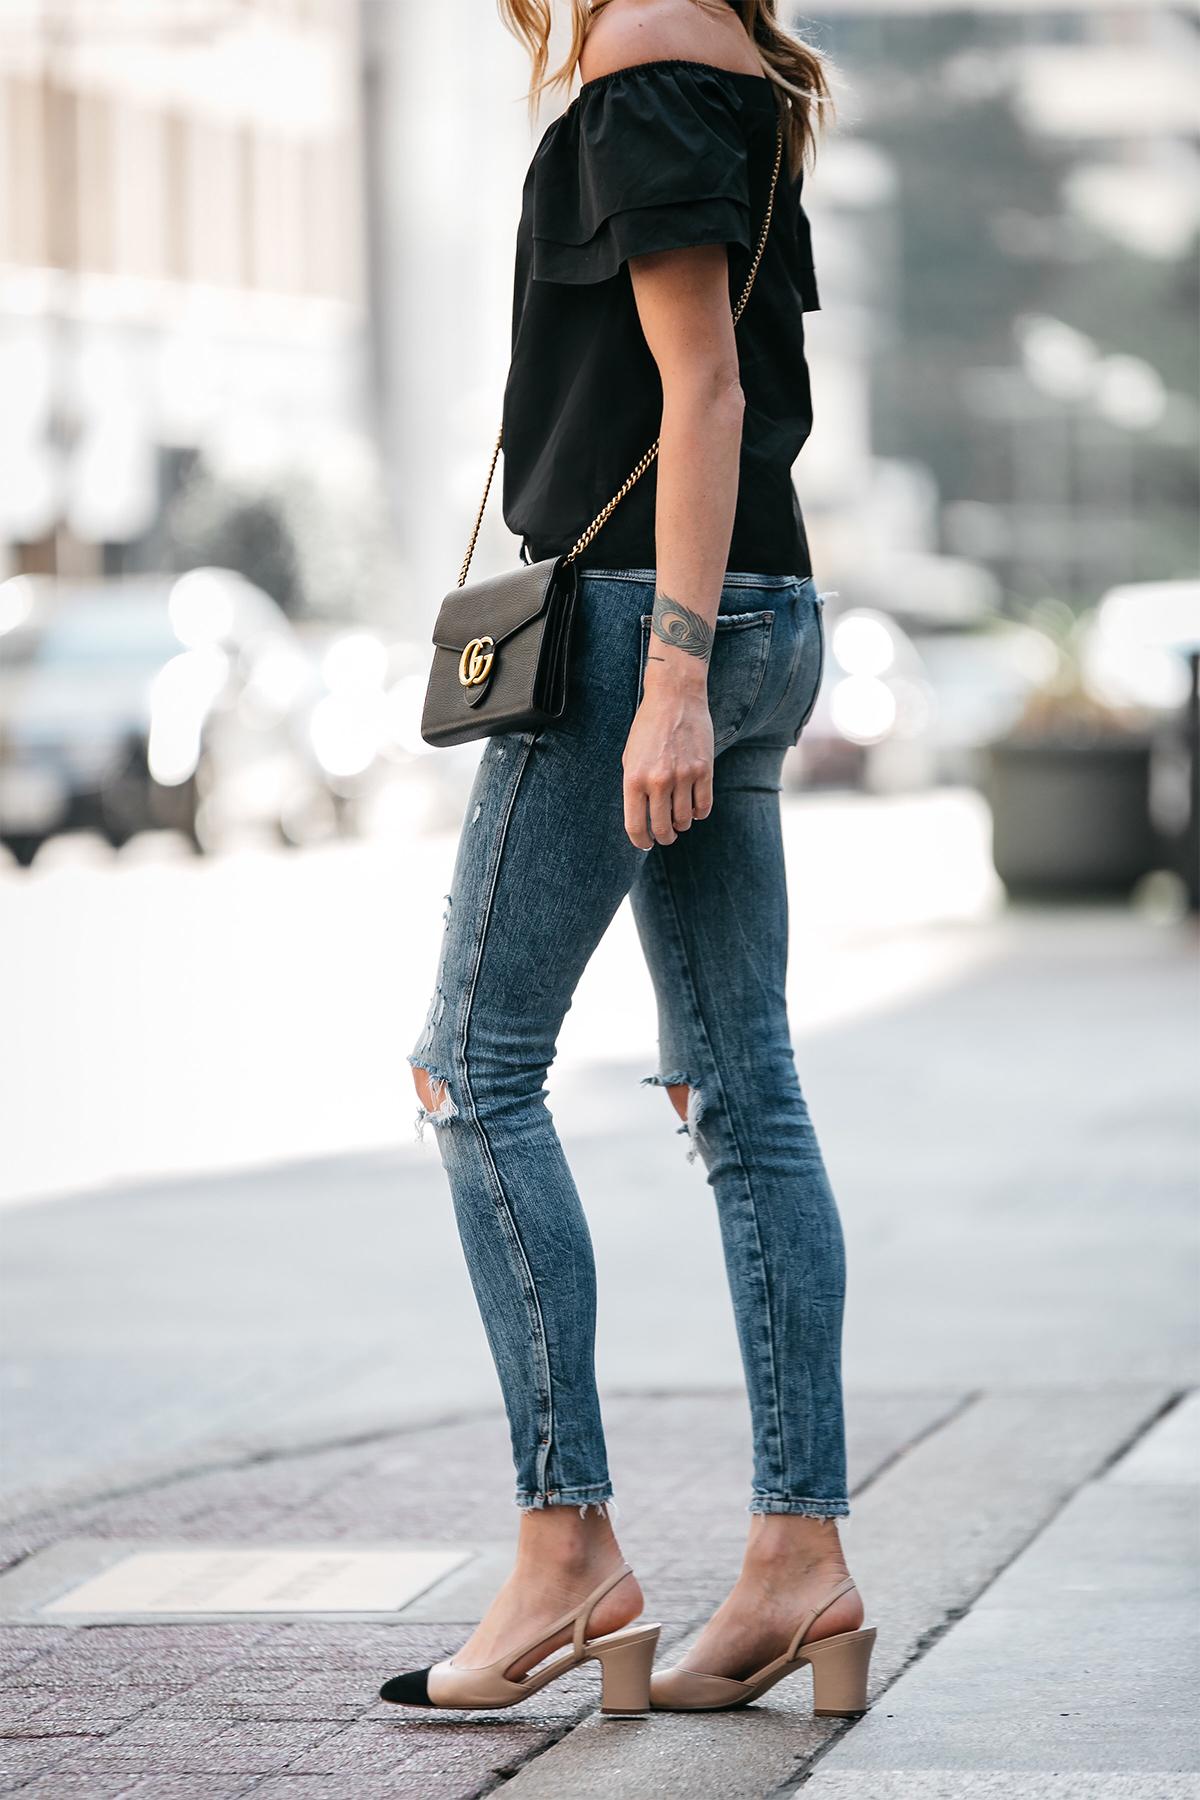 Fashion Jackson, Dallas Blogger, Fashion Blogger, Street Style, Black Short Sleeve Off-the-shoulder top, Zara Denim Ripped Skinny Jeans, Gucci Marmont Handbag, Similar Chanel Slingbacks